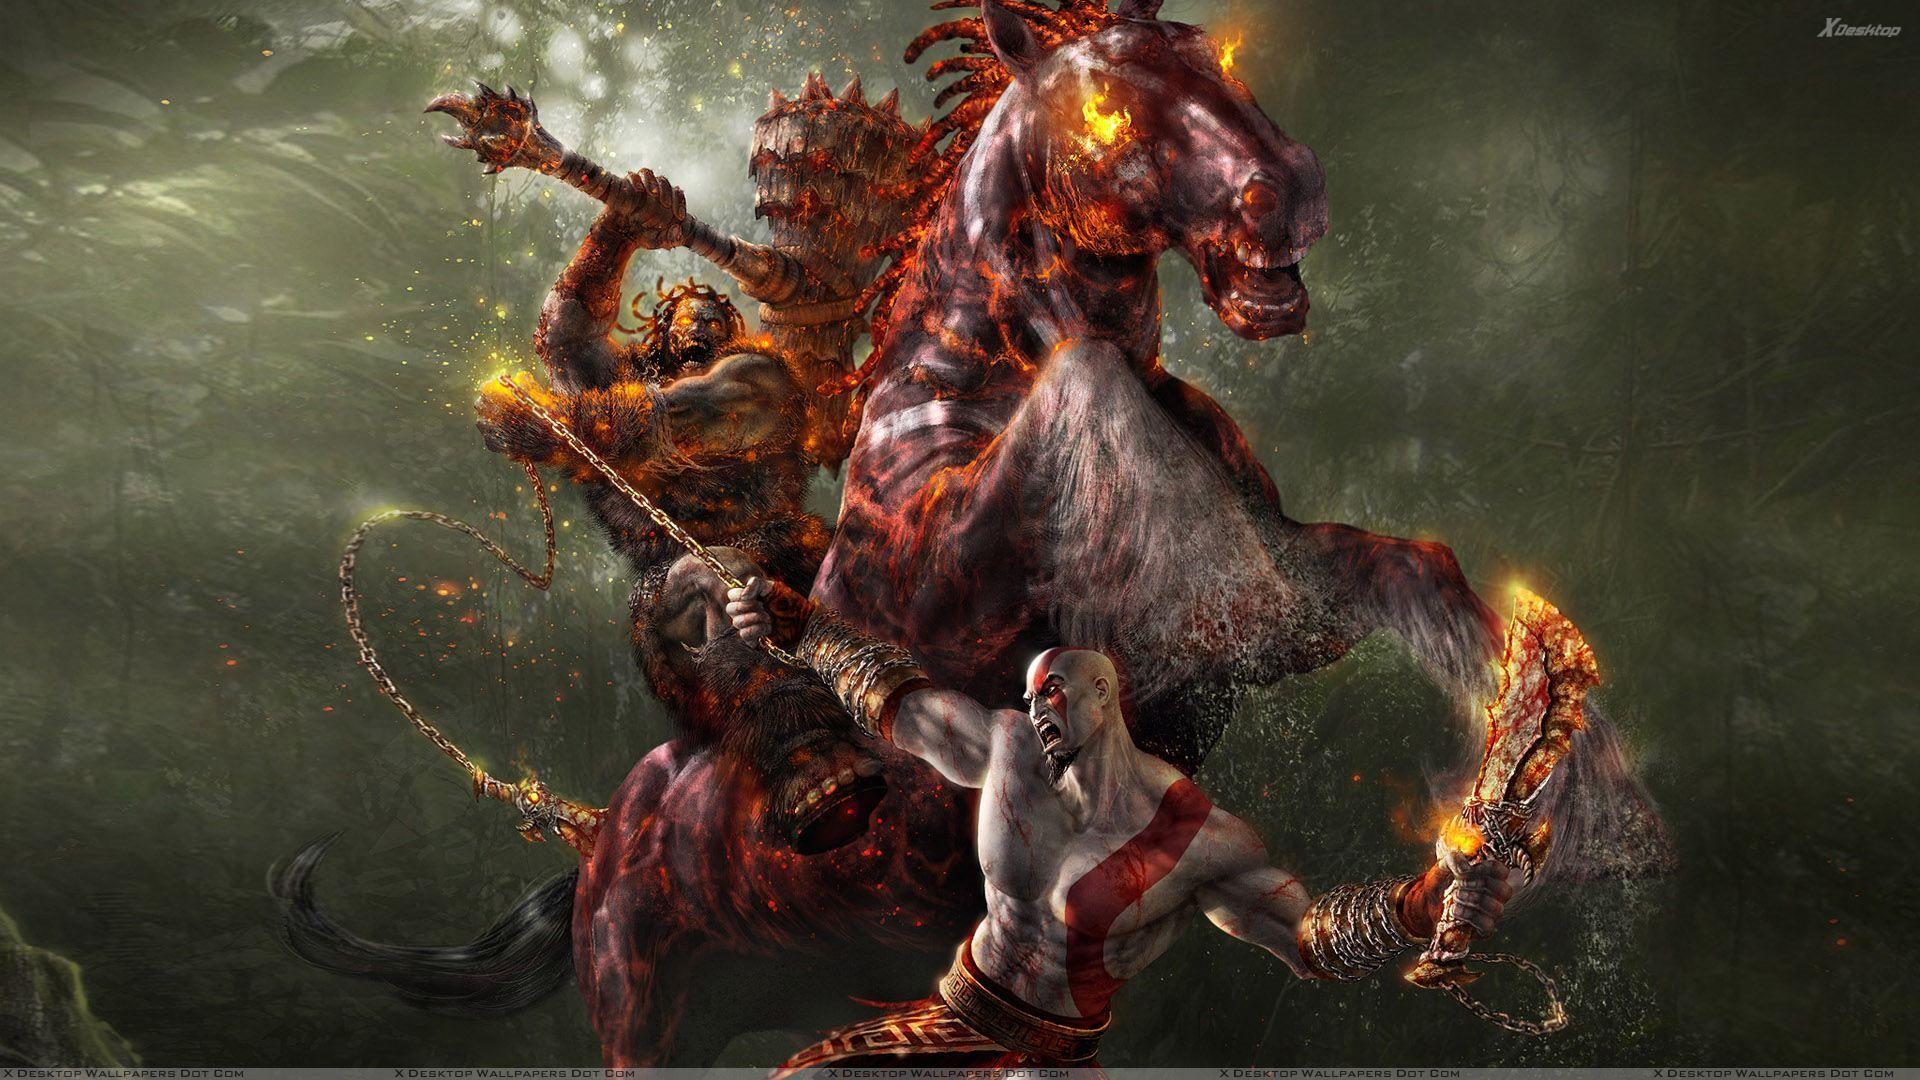 Pin By Wanda O Neal On The Four Horsemen Kratos God Of War